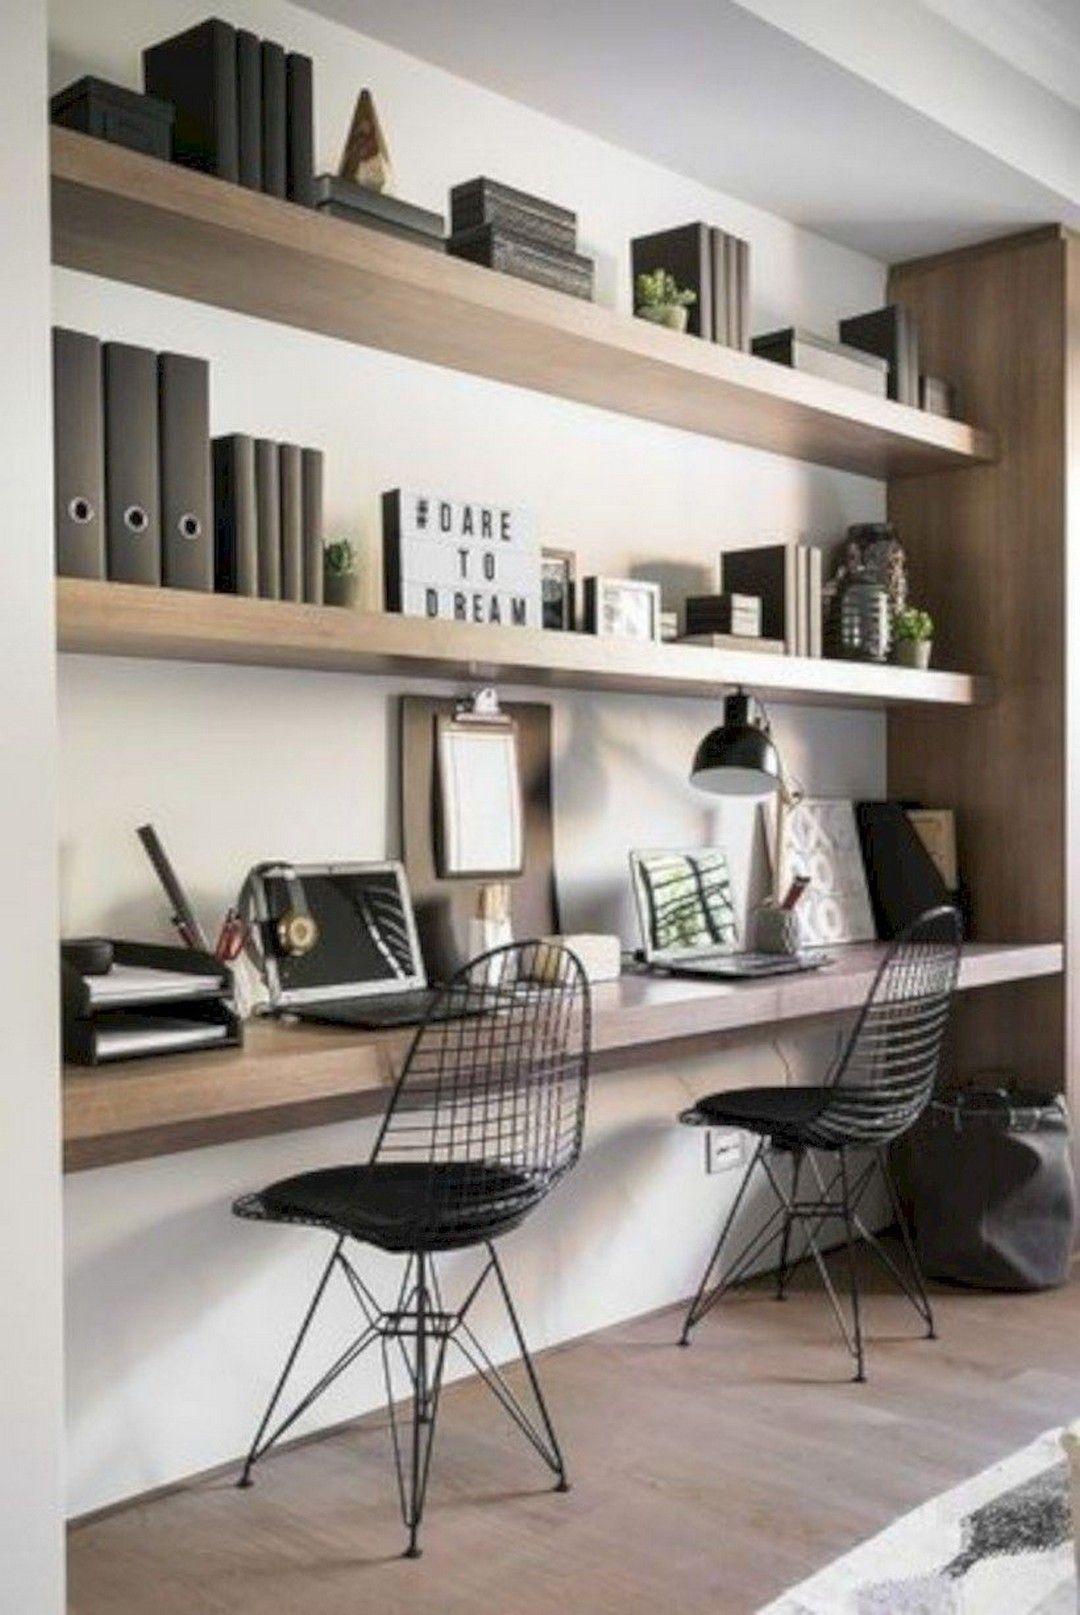 30 small corner shelves for living room decorating ideas on smart corner home office ideas id=37771